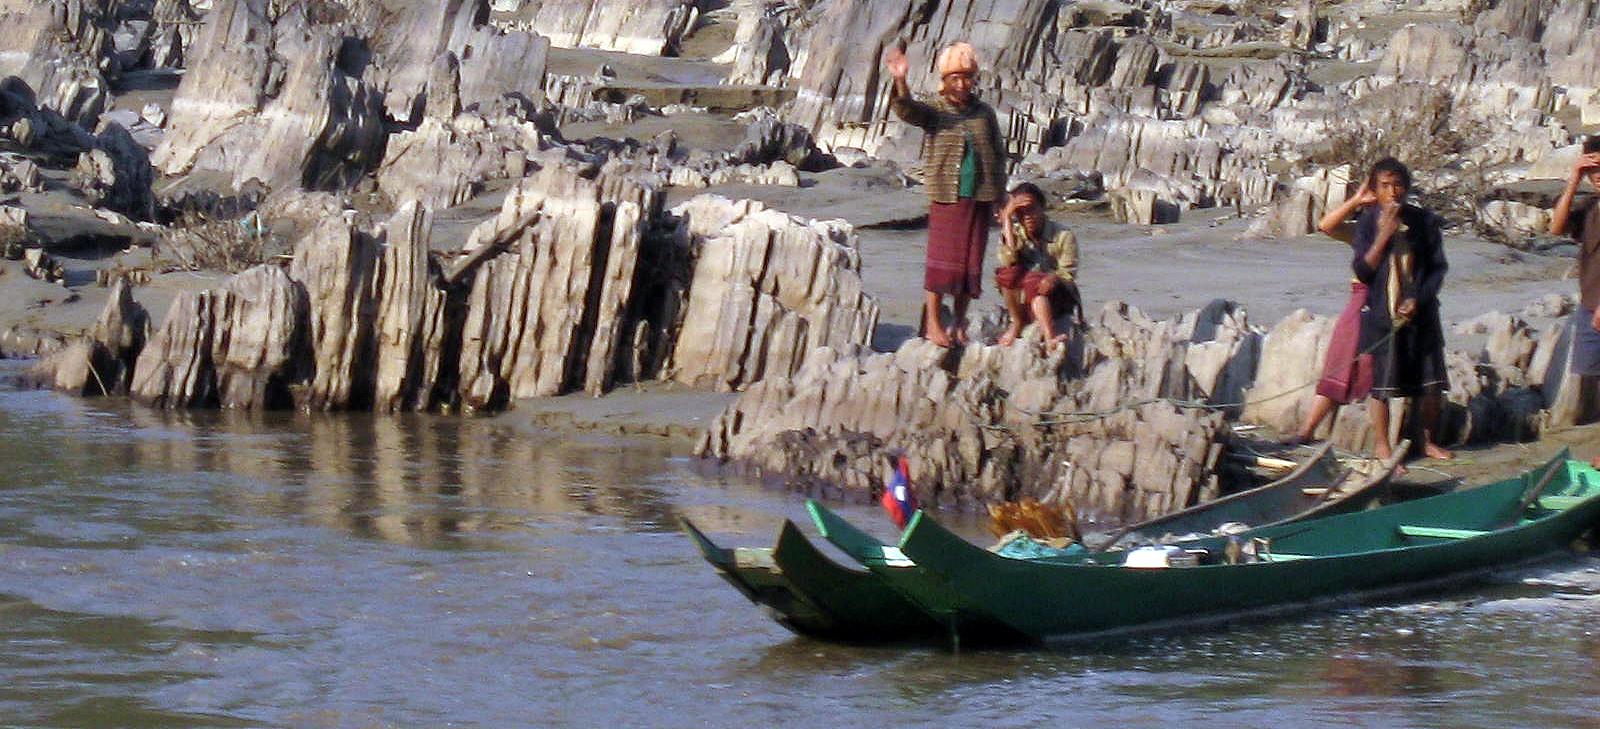 Fisherpeople along the Mekong - Laos